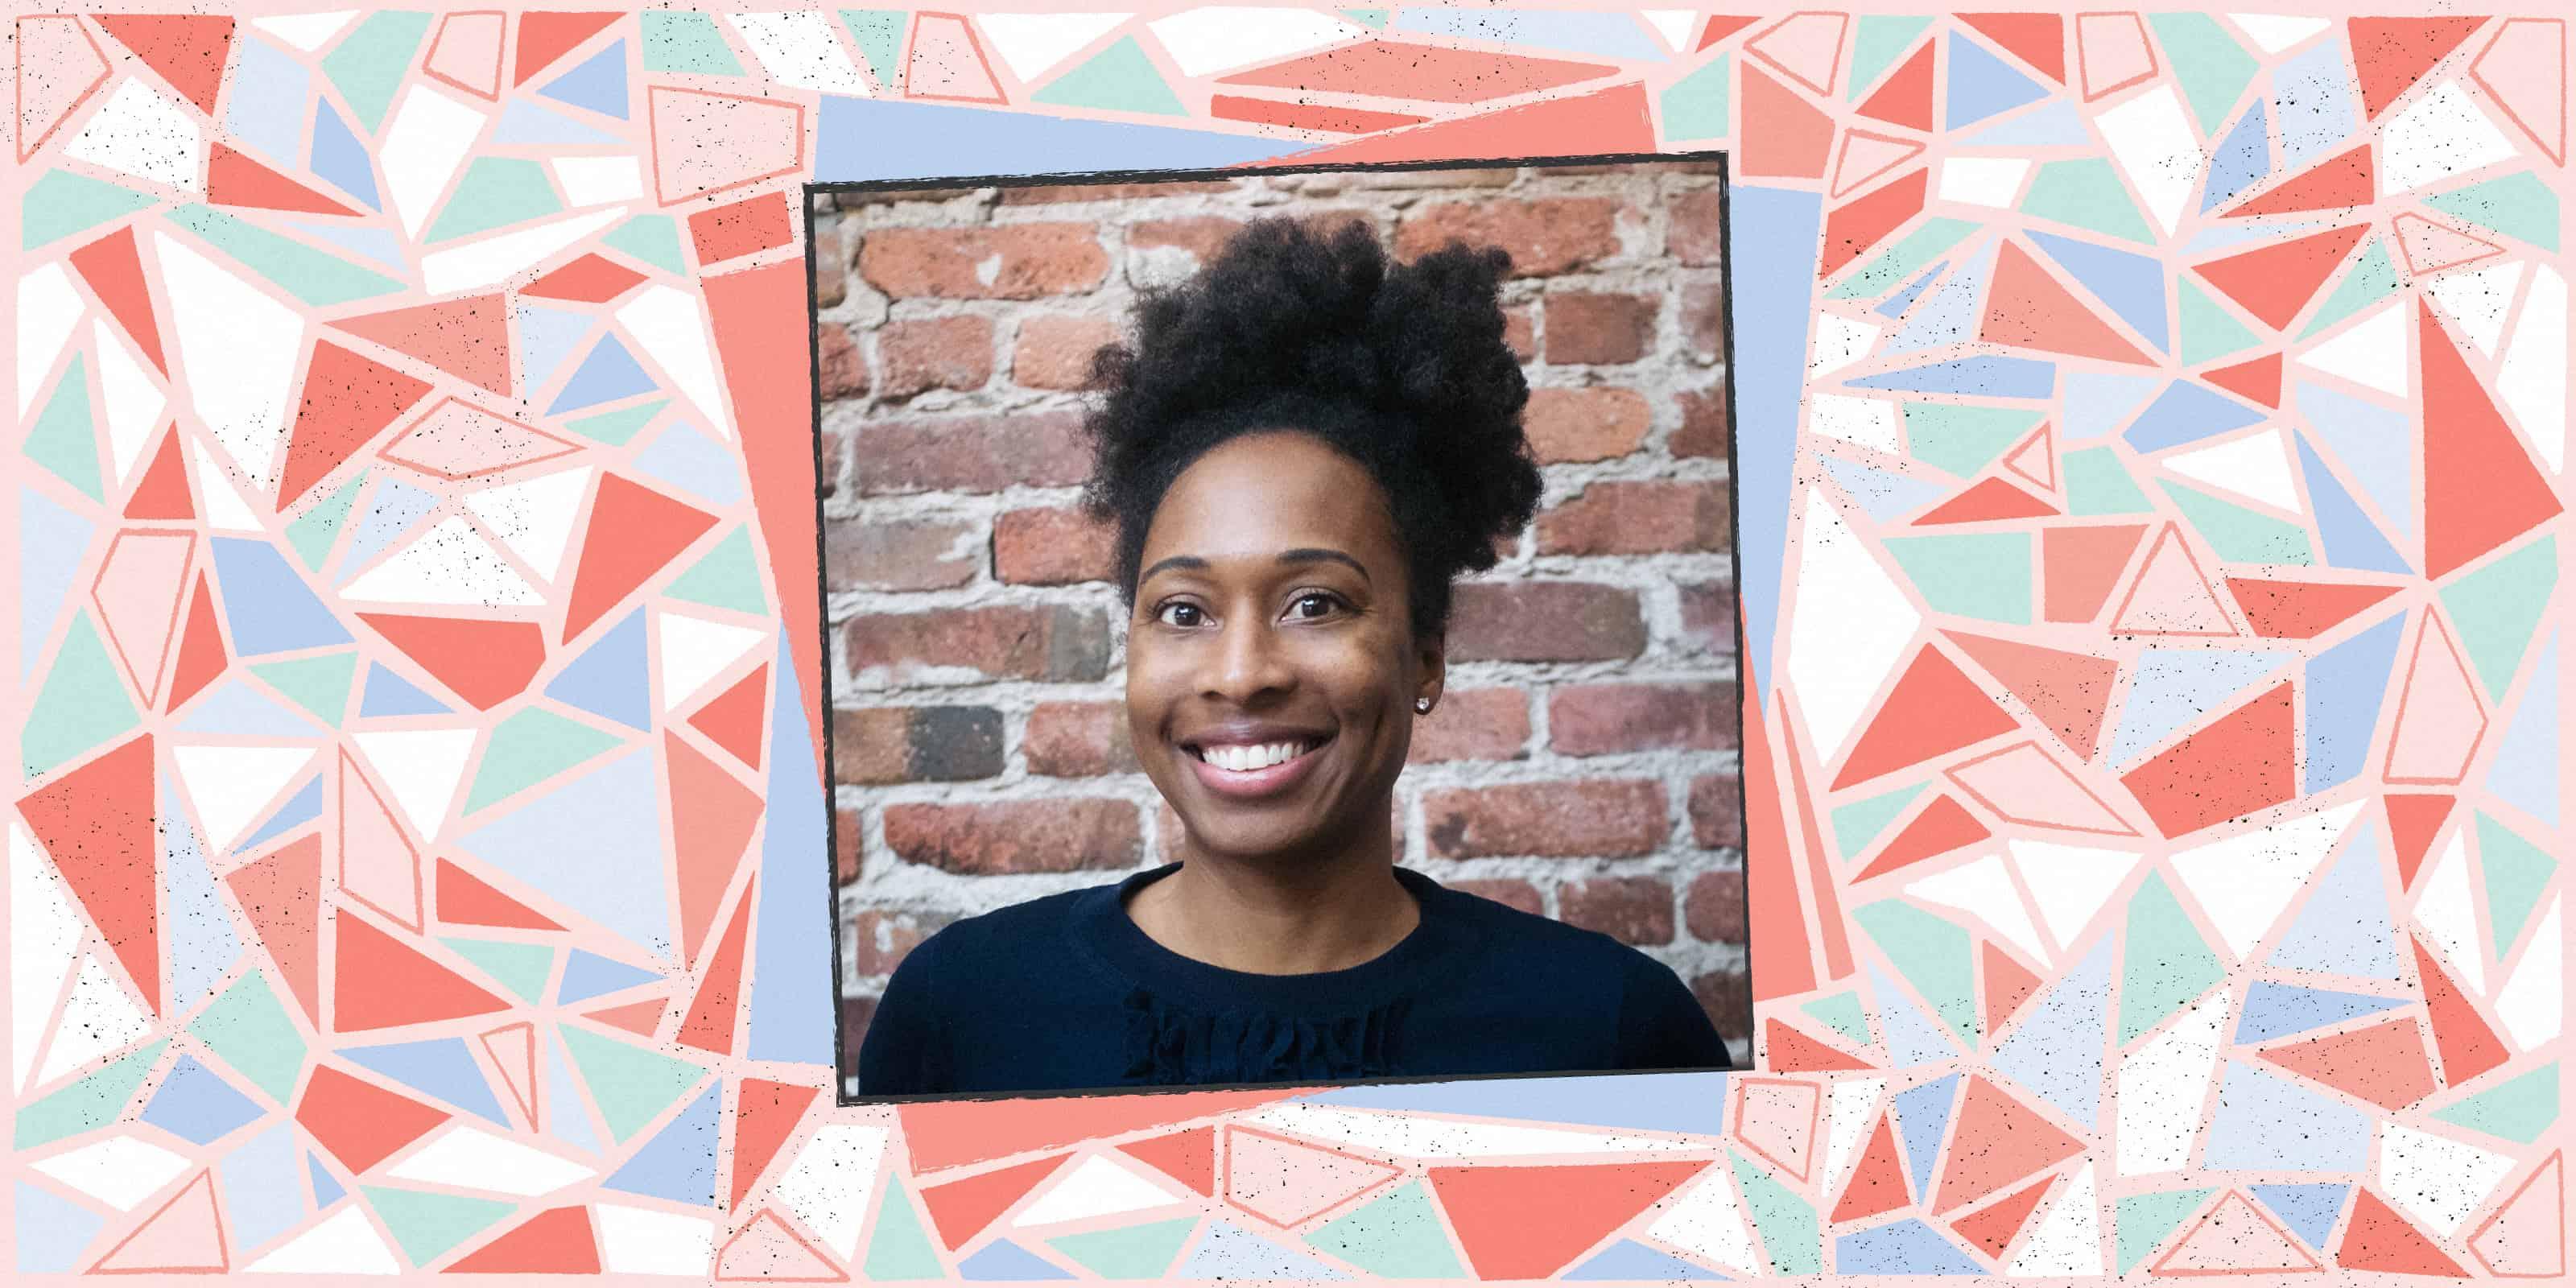 Black History Month employee spotlight: LaShaun Williams